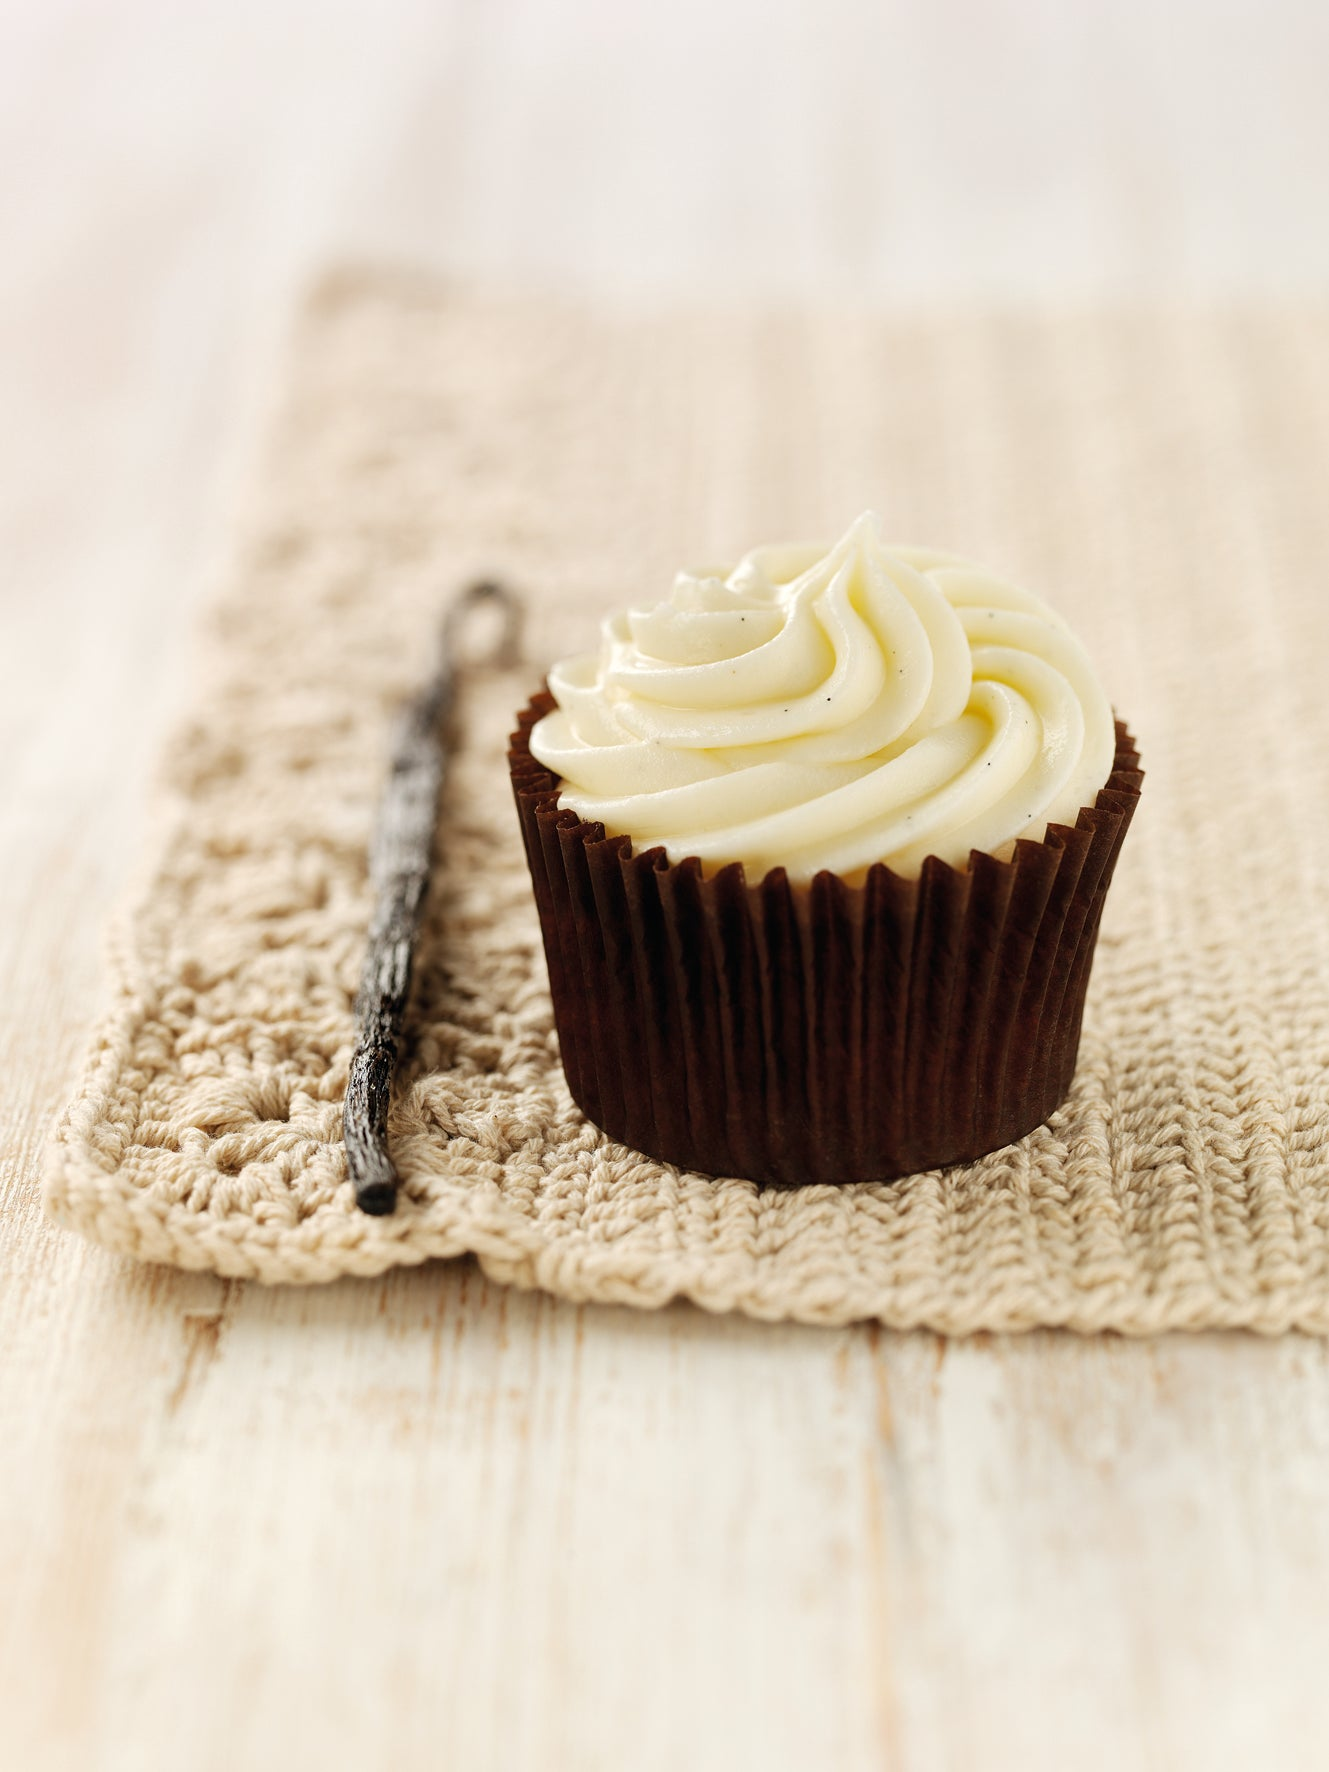 Nielsen-Massey-Vanilla-Cupcake.jpg